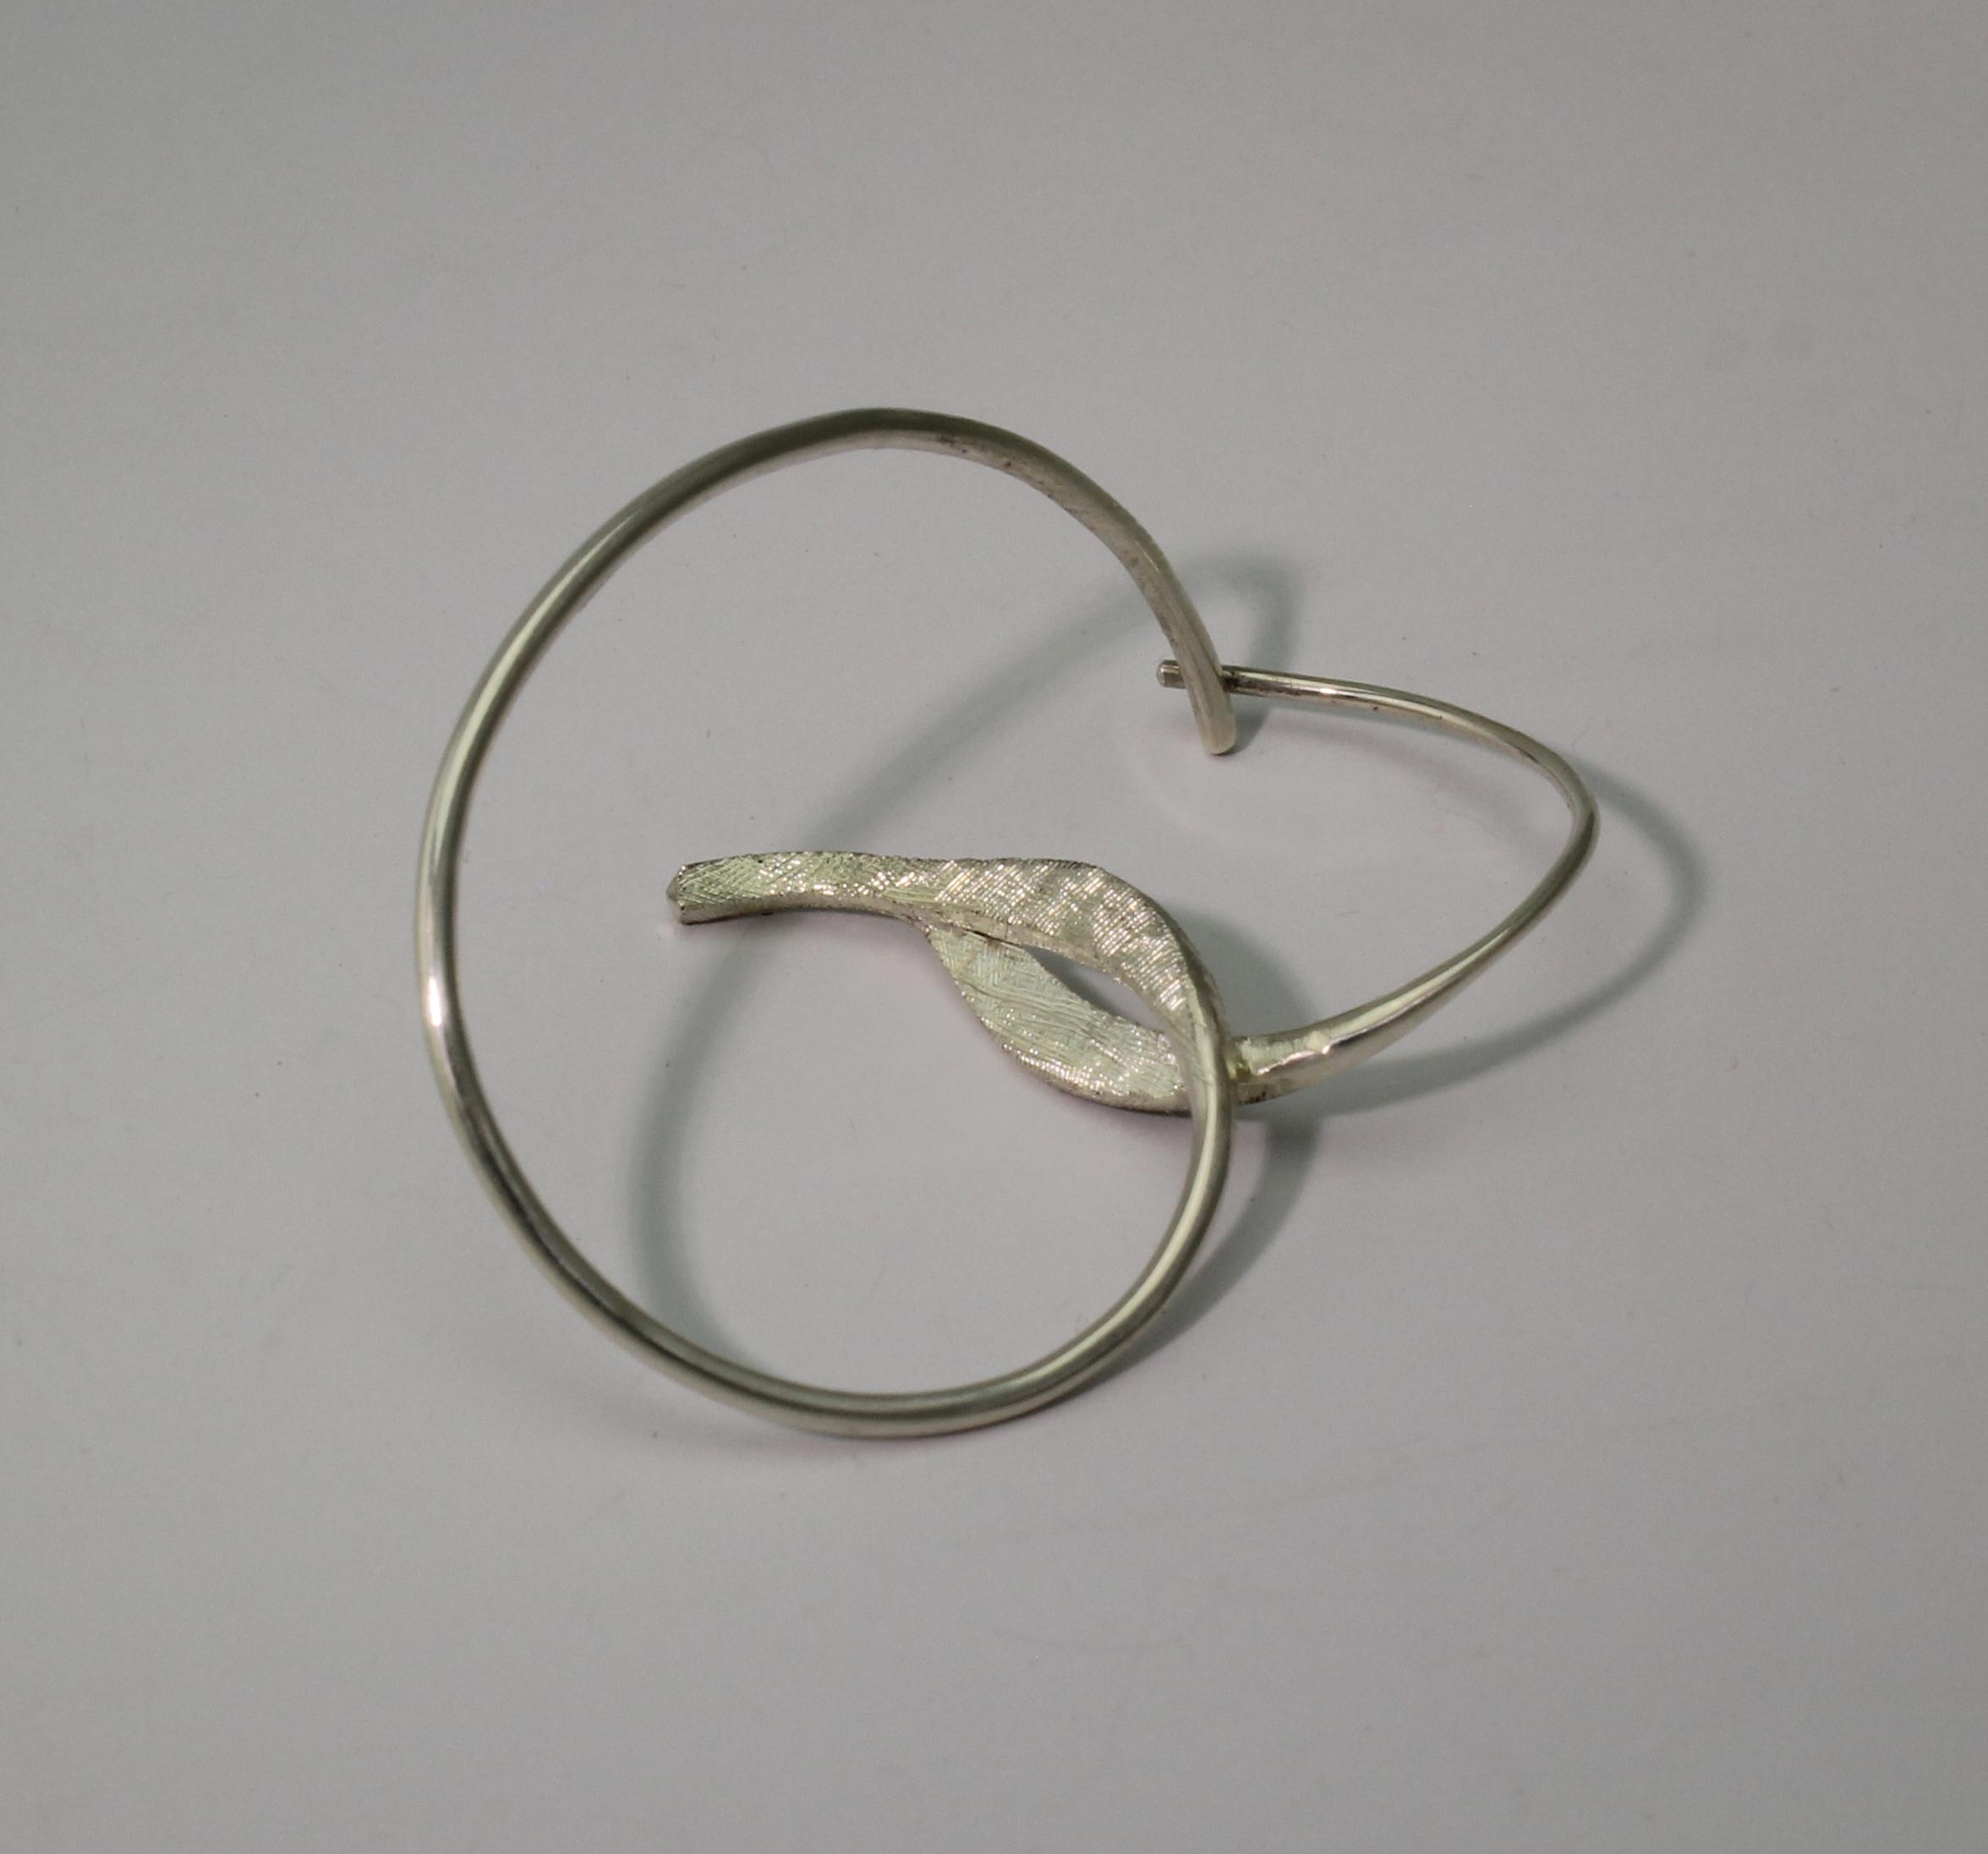 Line Drawing Earring